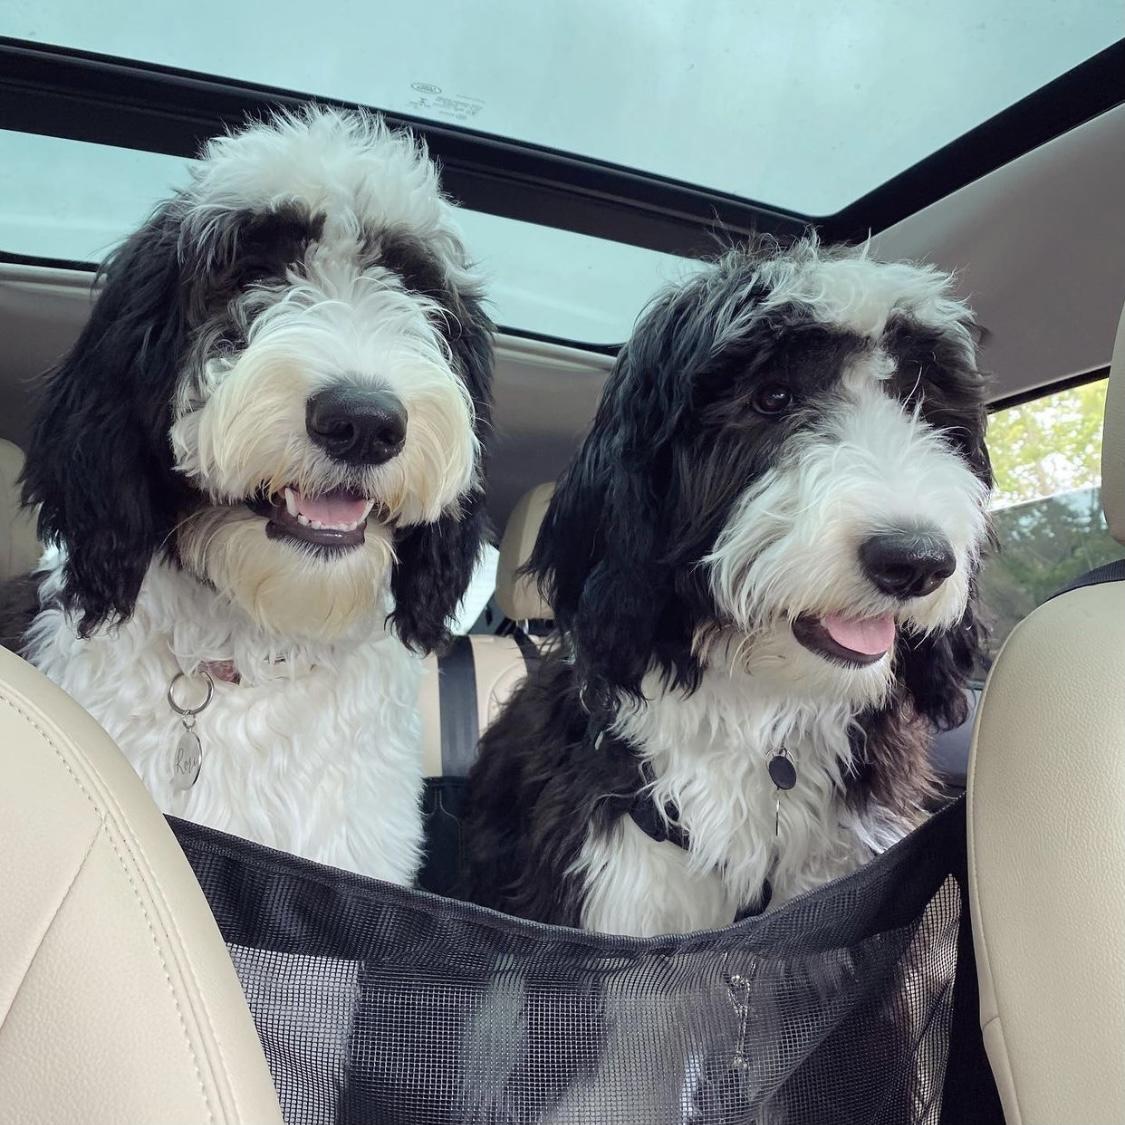 Sheepadoodles in the car